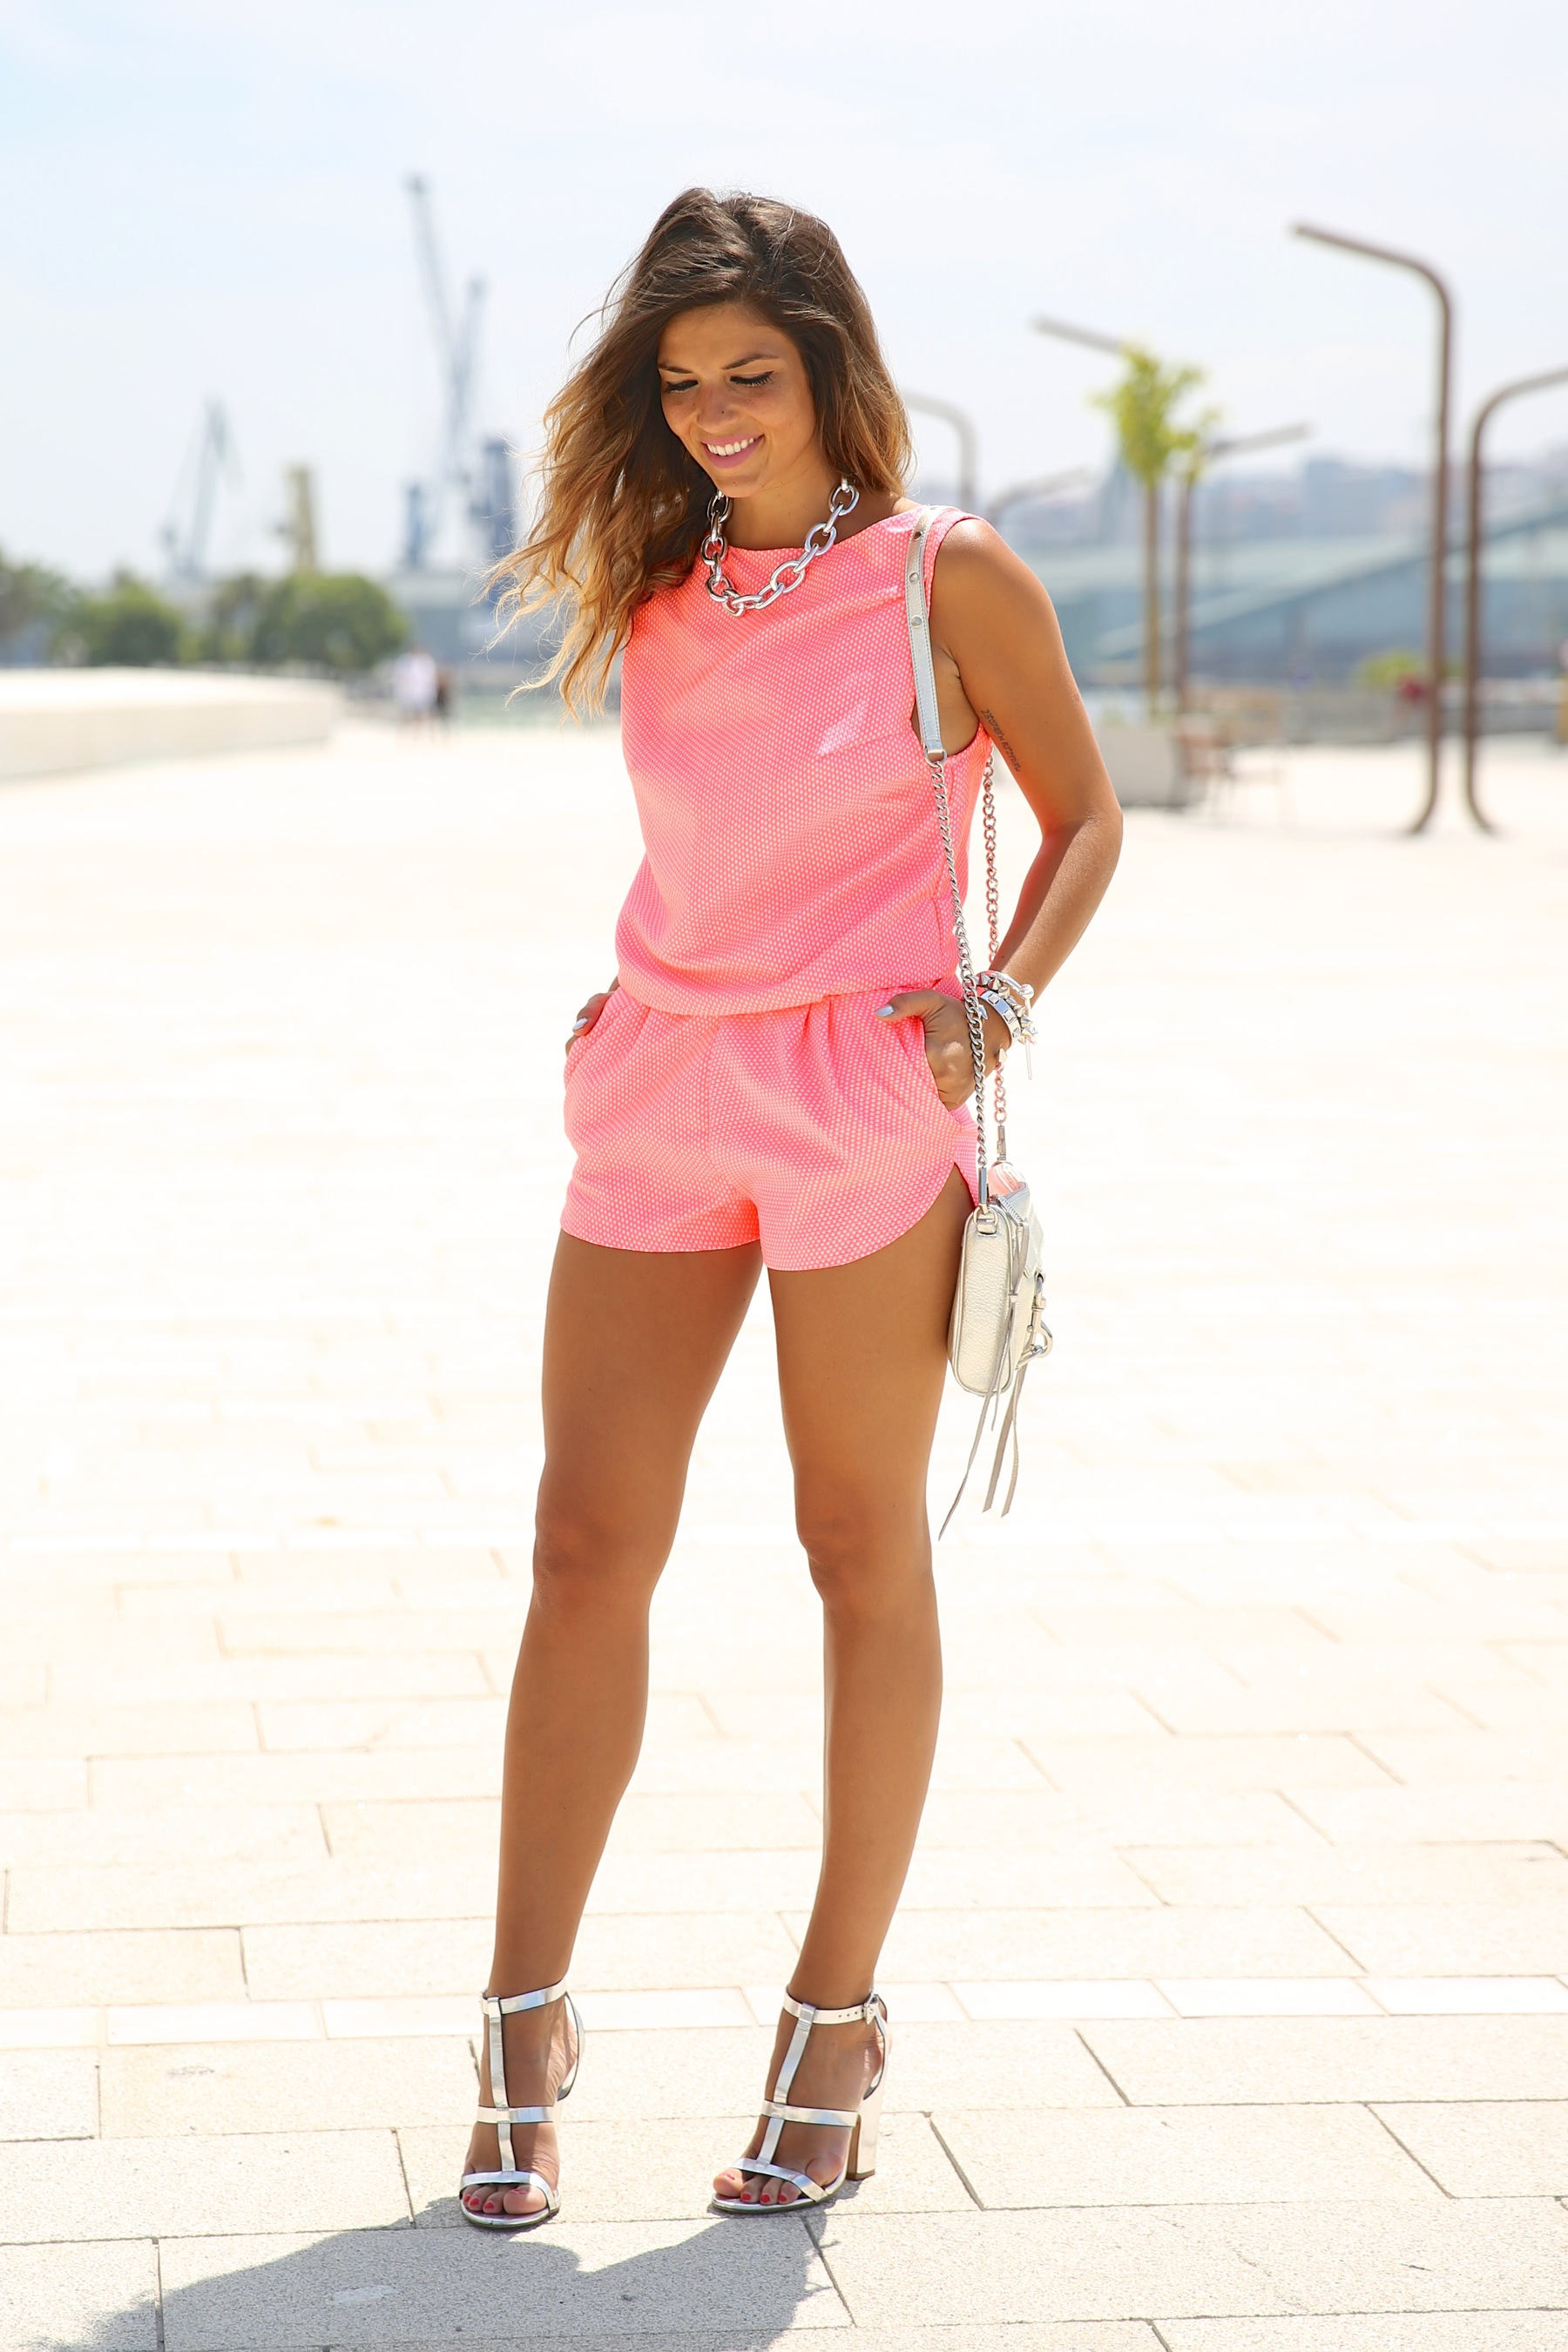 trendy_taste-look-outfit-street_style-ootd-blog-blogger-fashion_spain-moda_españa-silver_bag-bolso_plata-mono_rosa-mekdes-coruña-marina-10